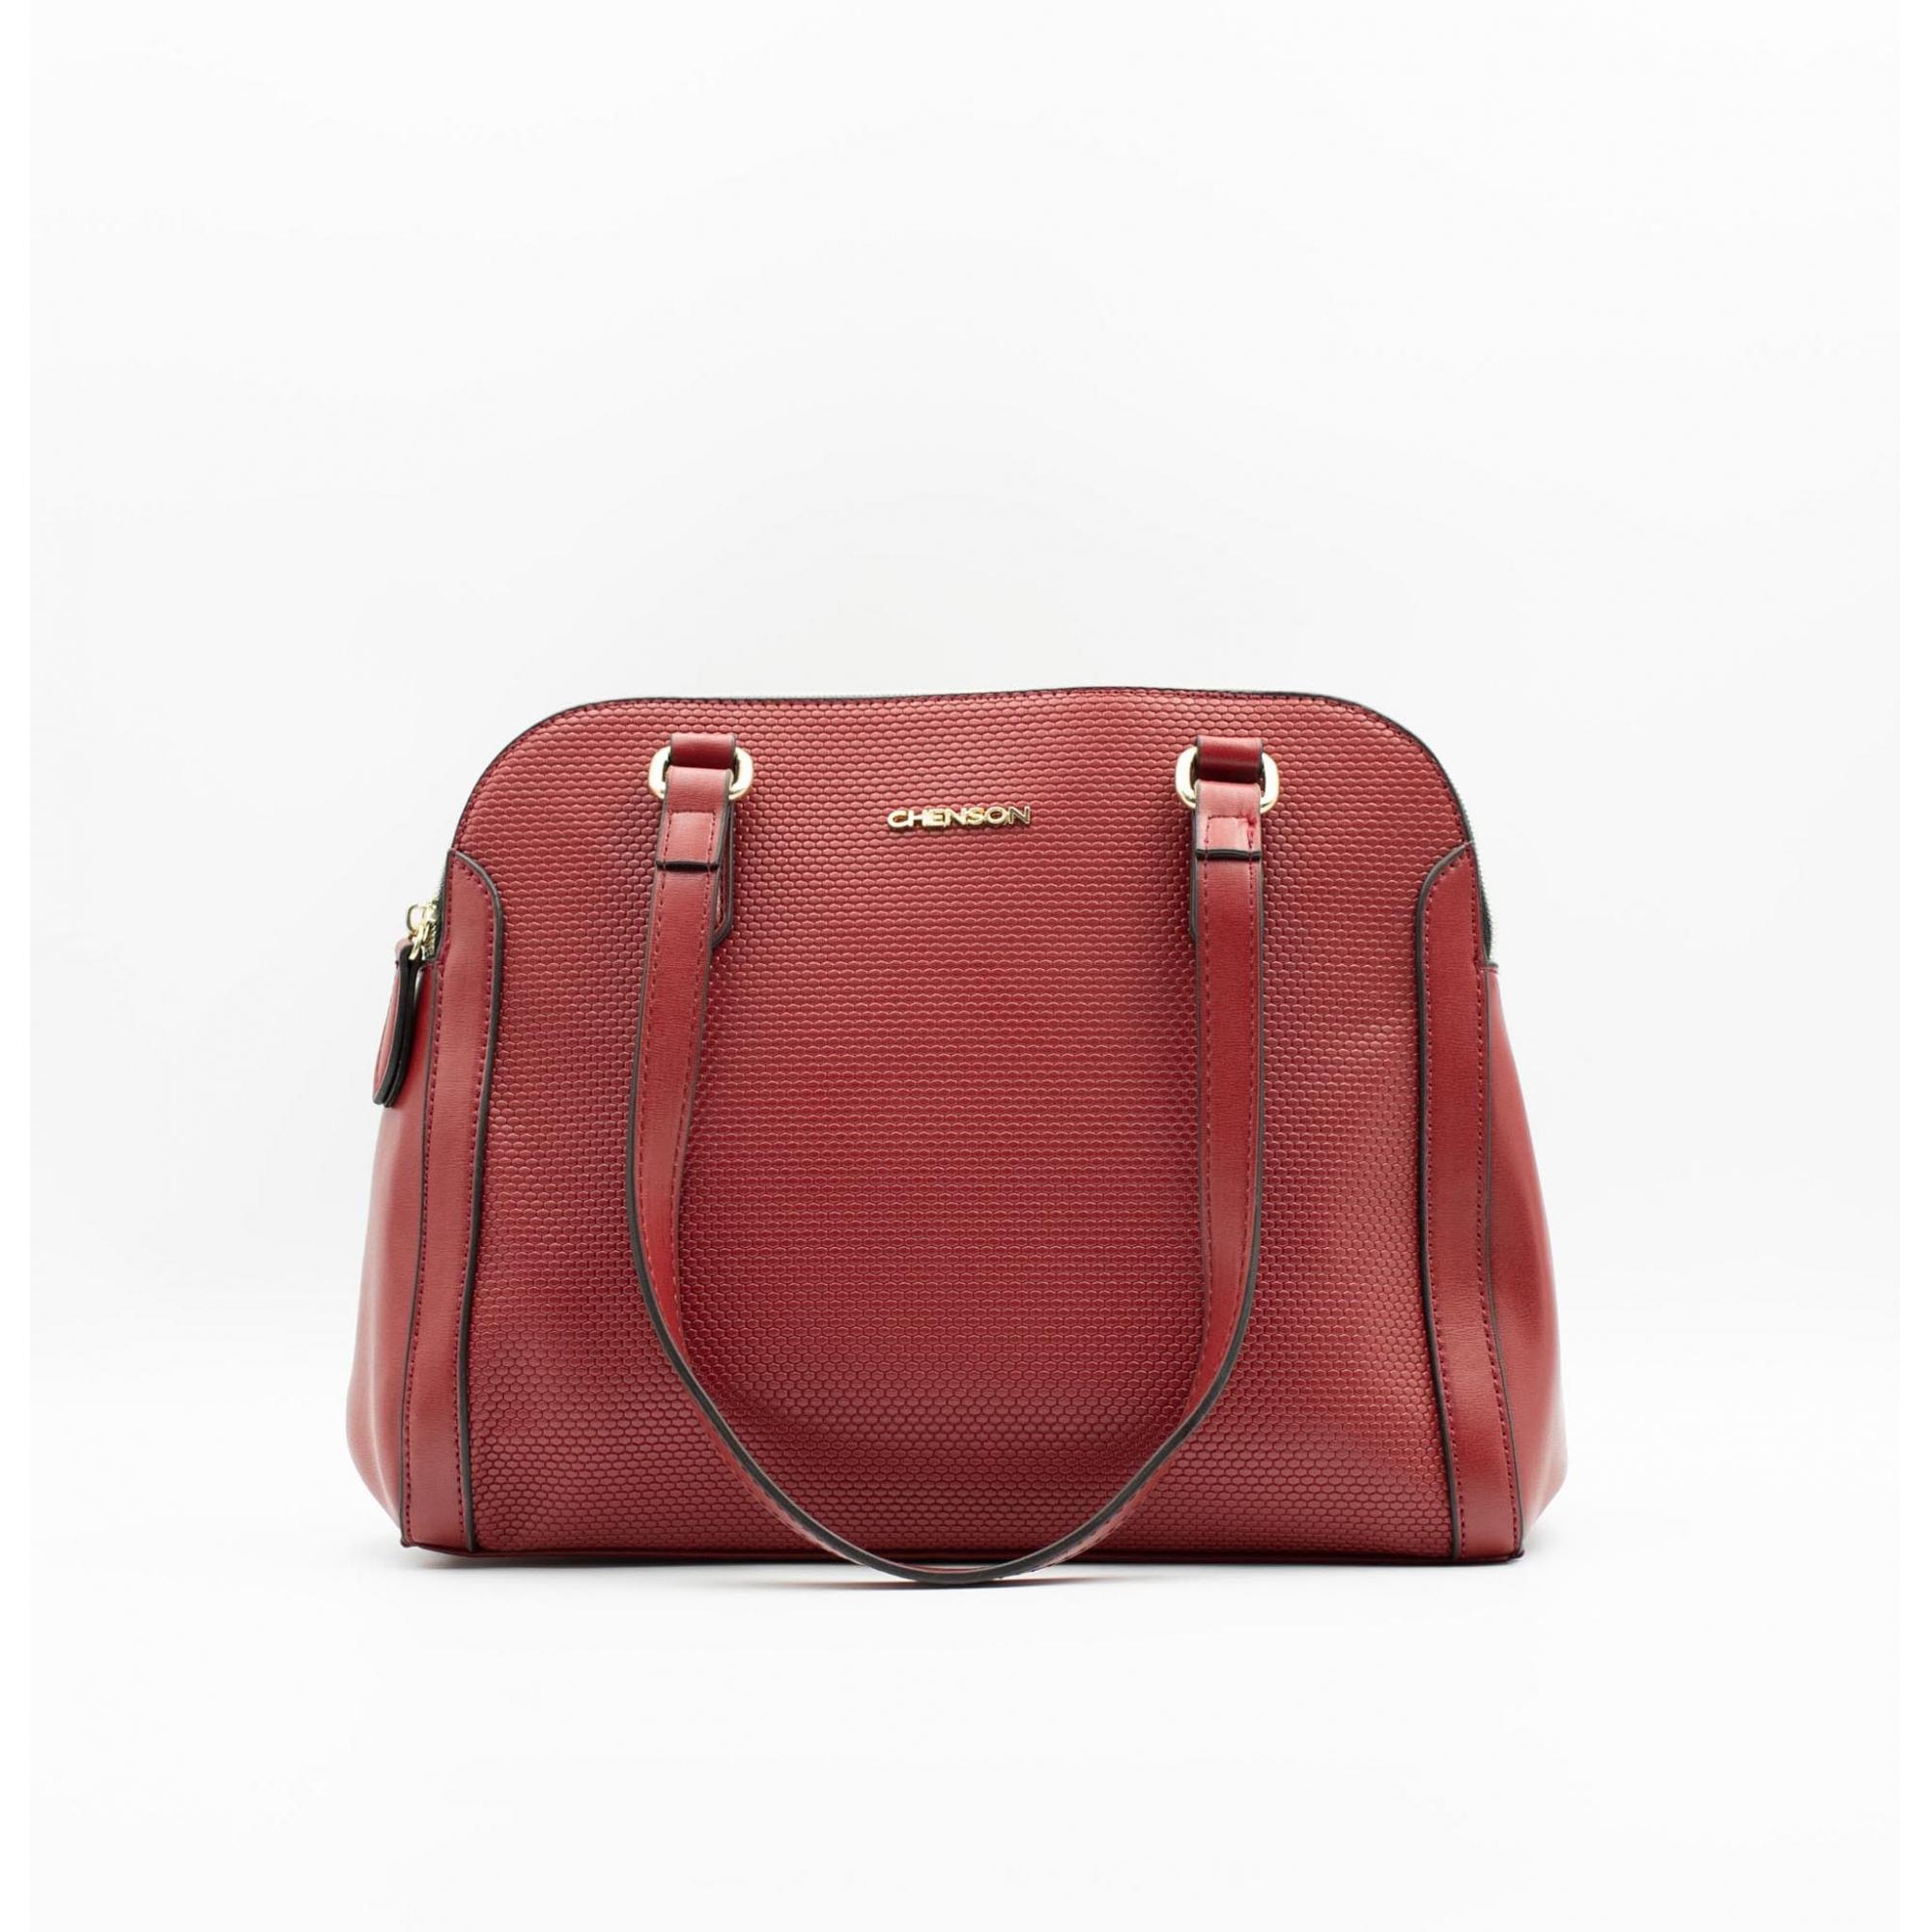 Bolsa Chenson Vermelho